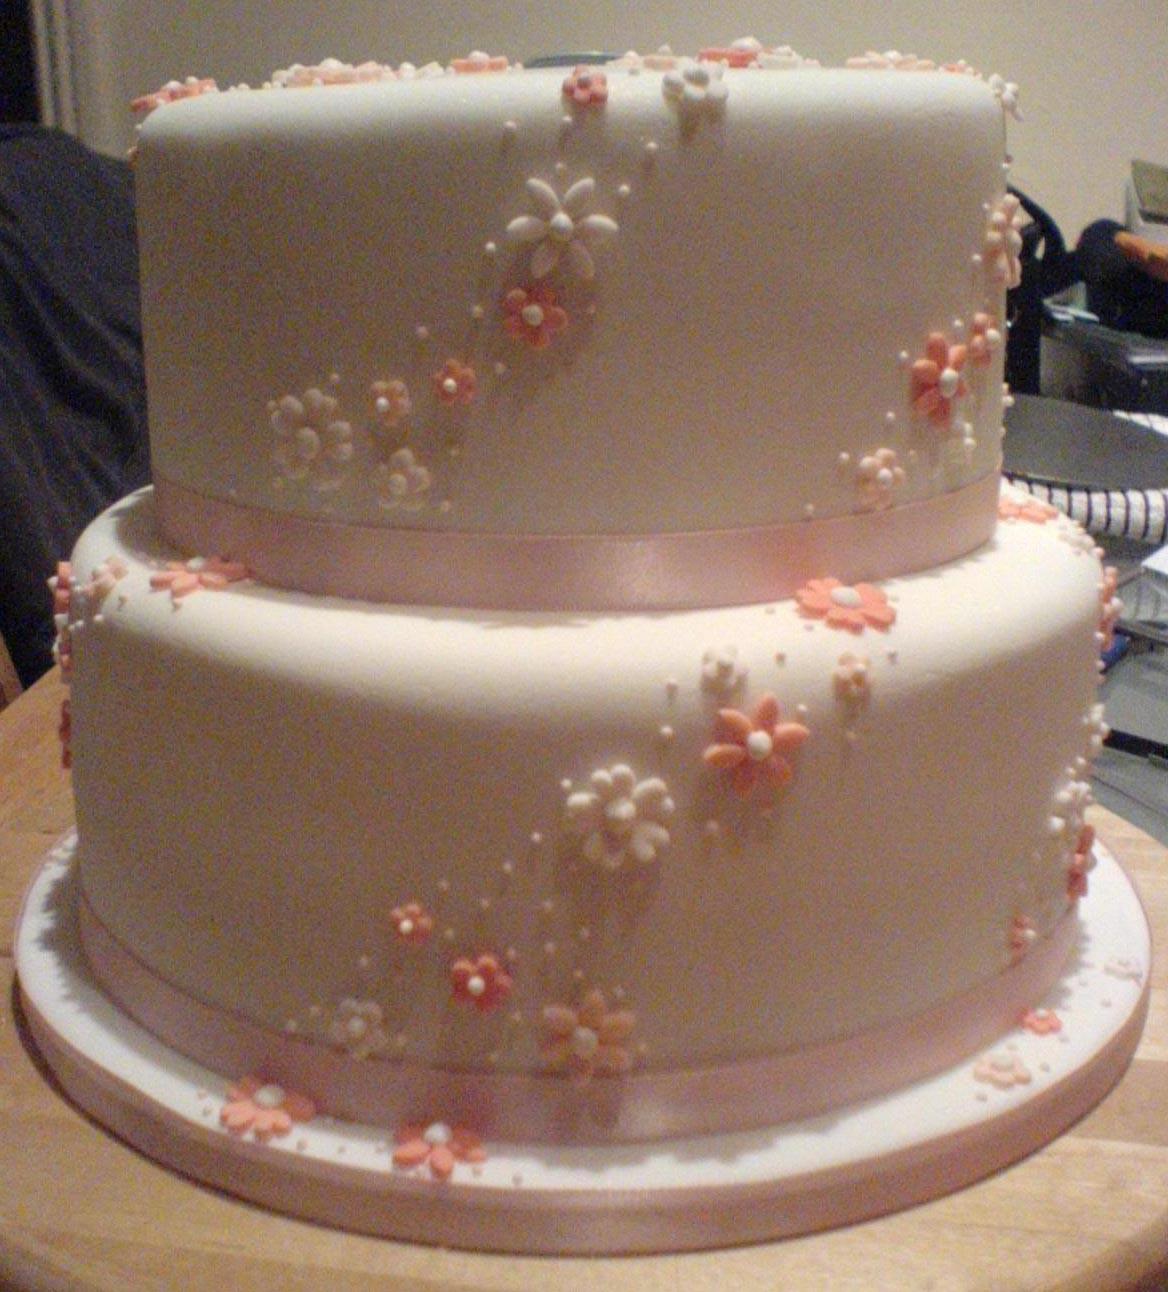 Cozzmic Cakes Two Tier Wedding Cake Pink Flowers